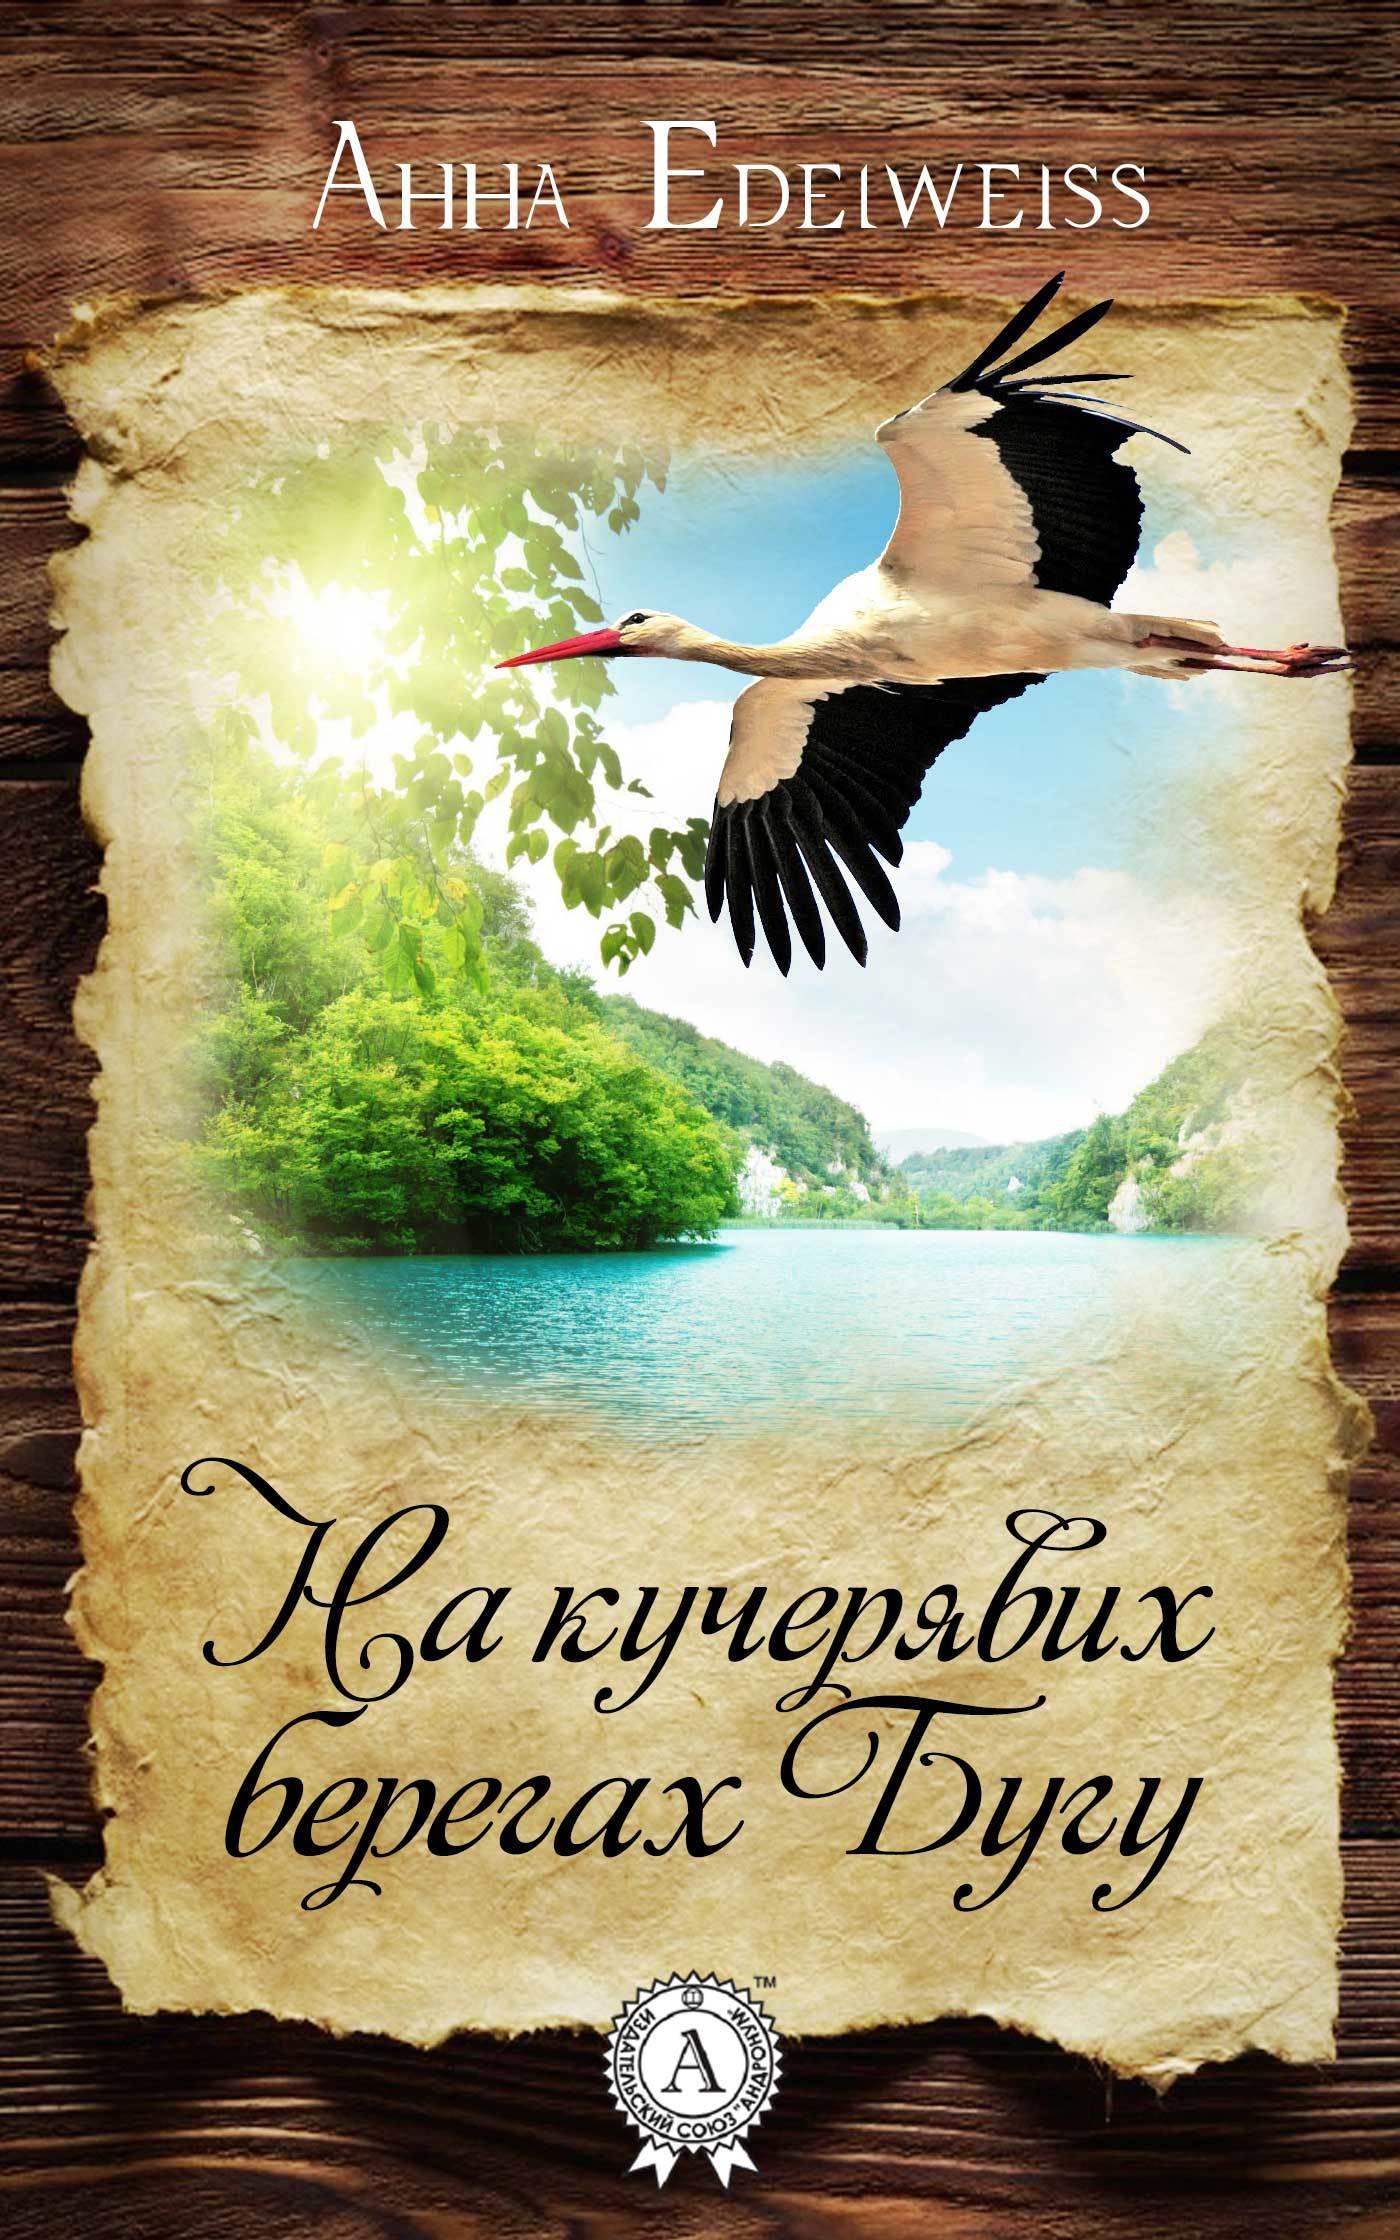 Анна Edelweiss - На кучерявих берегах Бугу